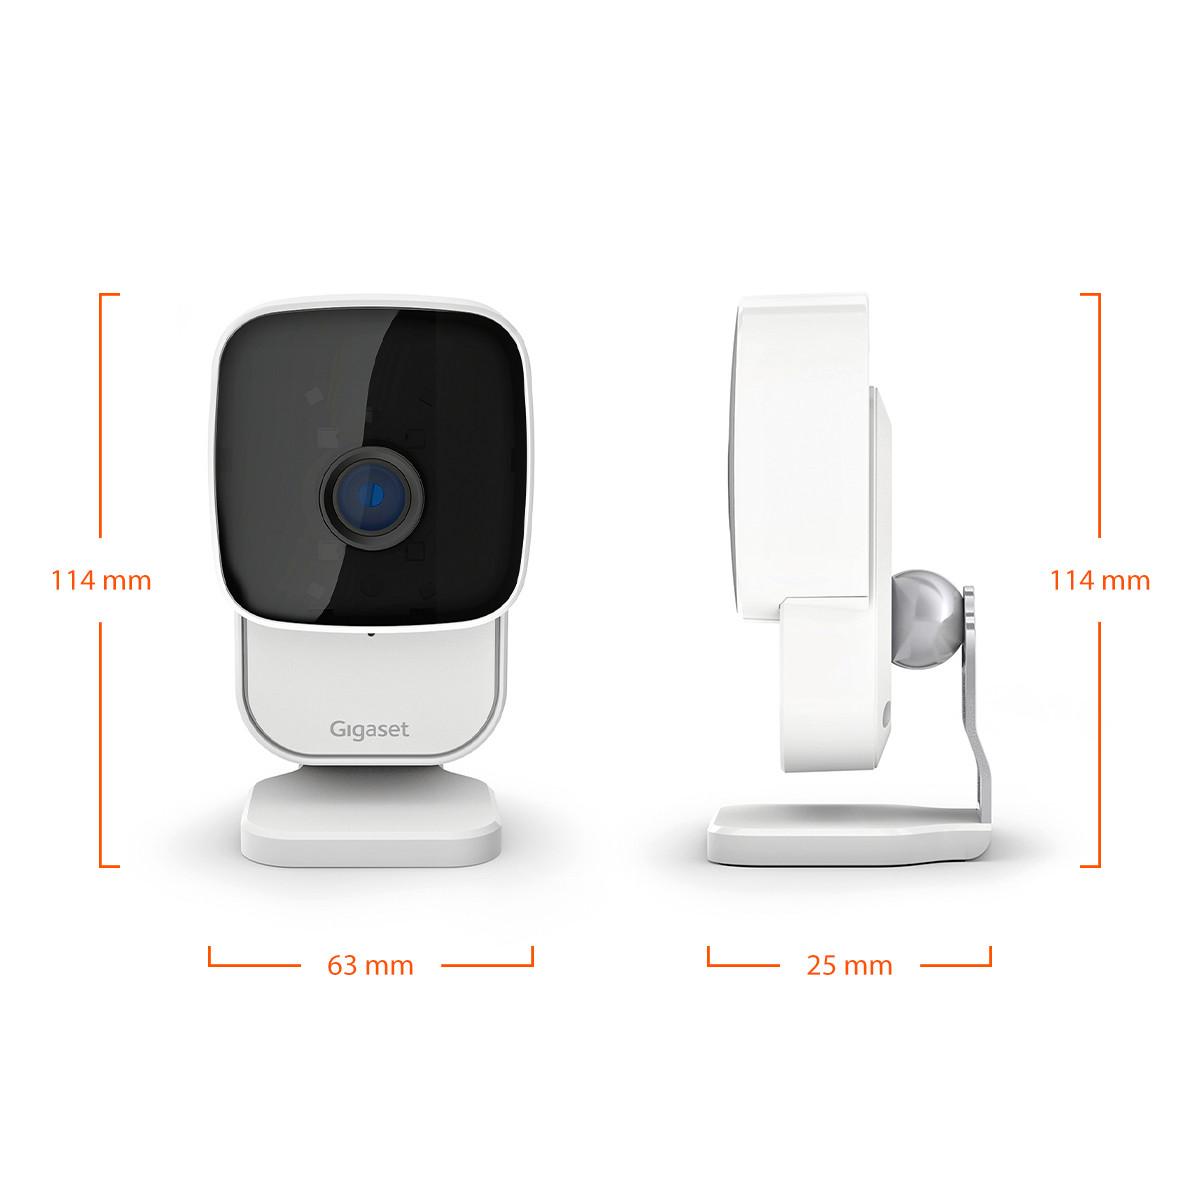 Caméra Gigaset 2.0